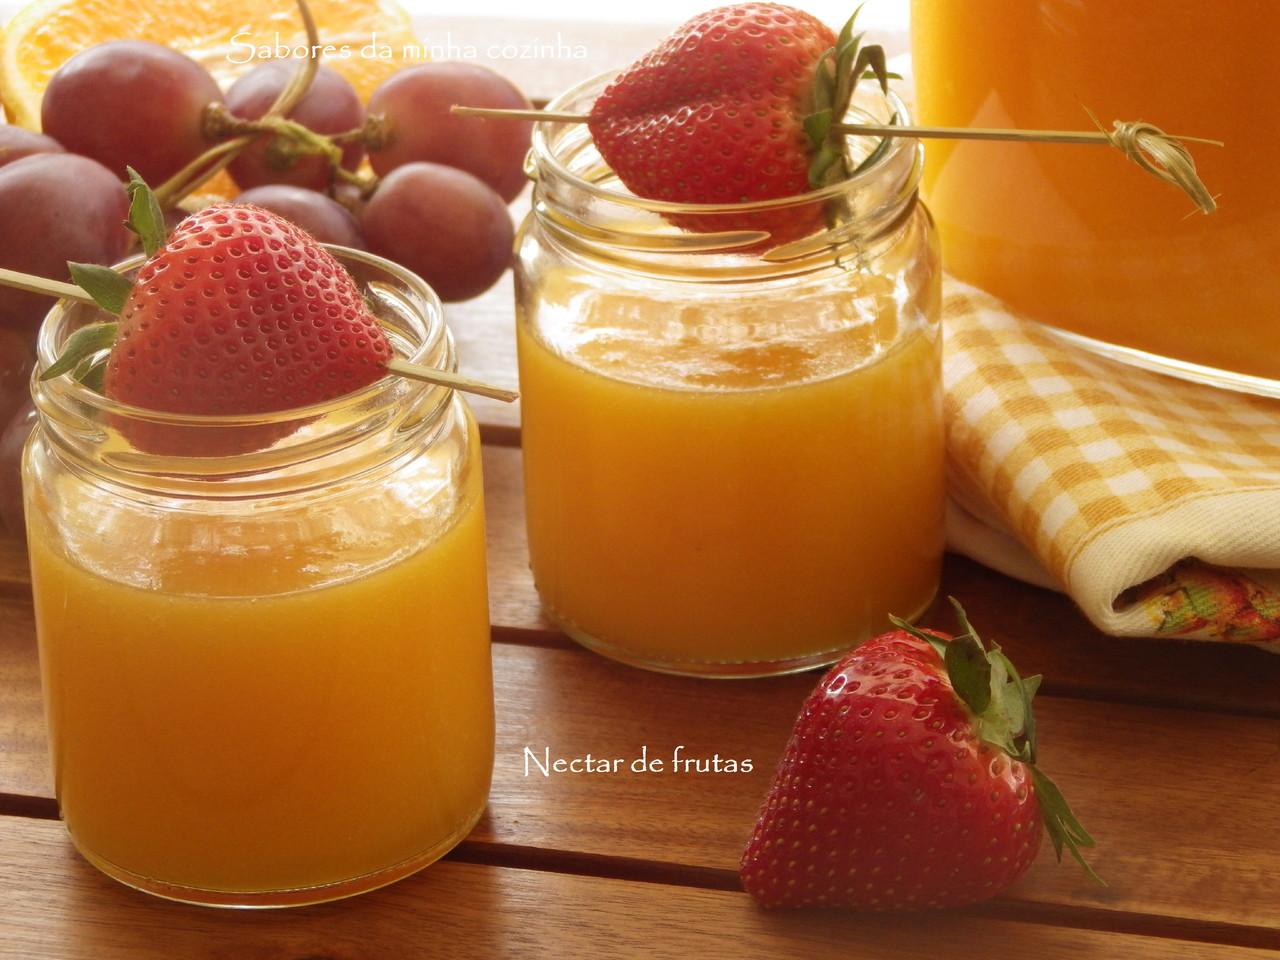 IMGP4775-Nectar de frutas-Blog.JPG